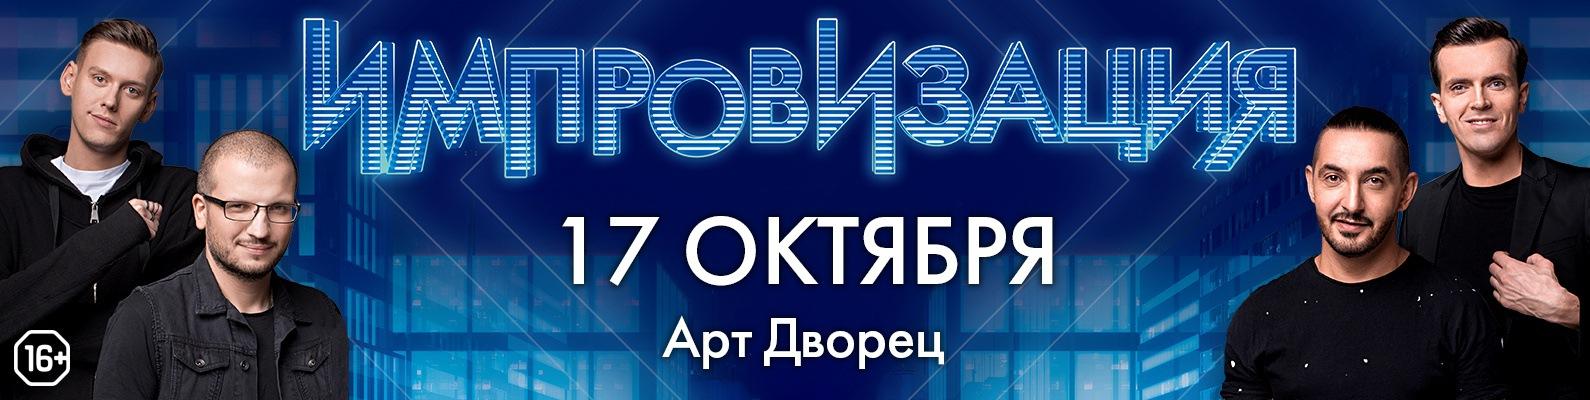 ИМПРОВИЗАЦИЯ ТНТ 17 ОКТЯБРЯ АРТ ДВОРЕЦ ВЛАДИМИР. | ВКонтакте